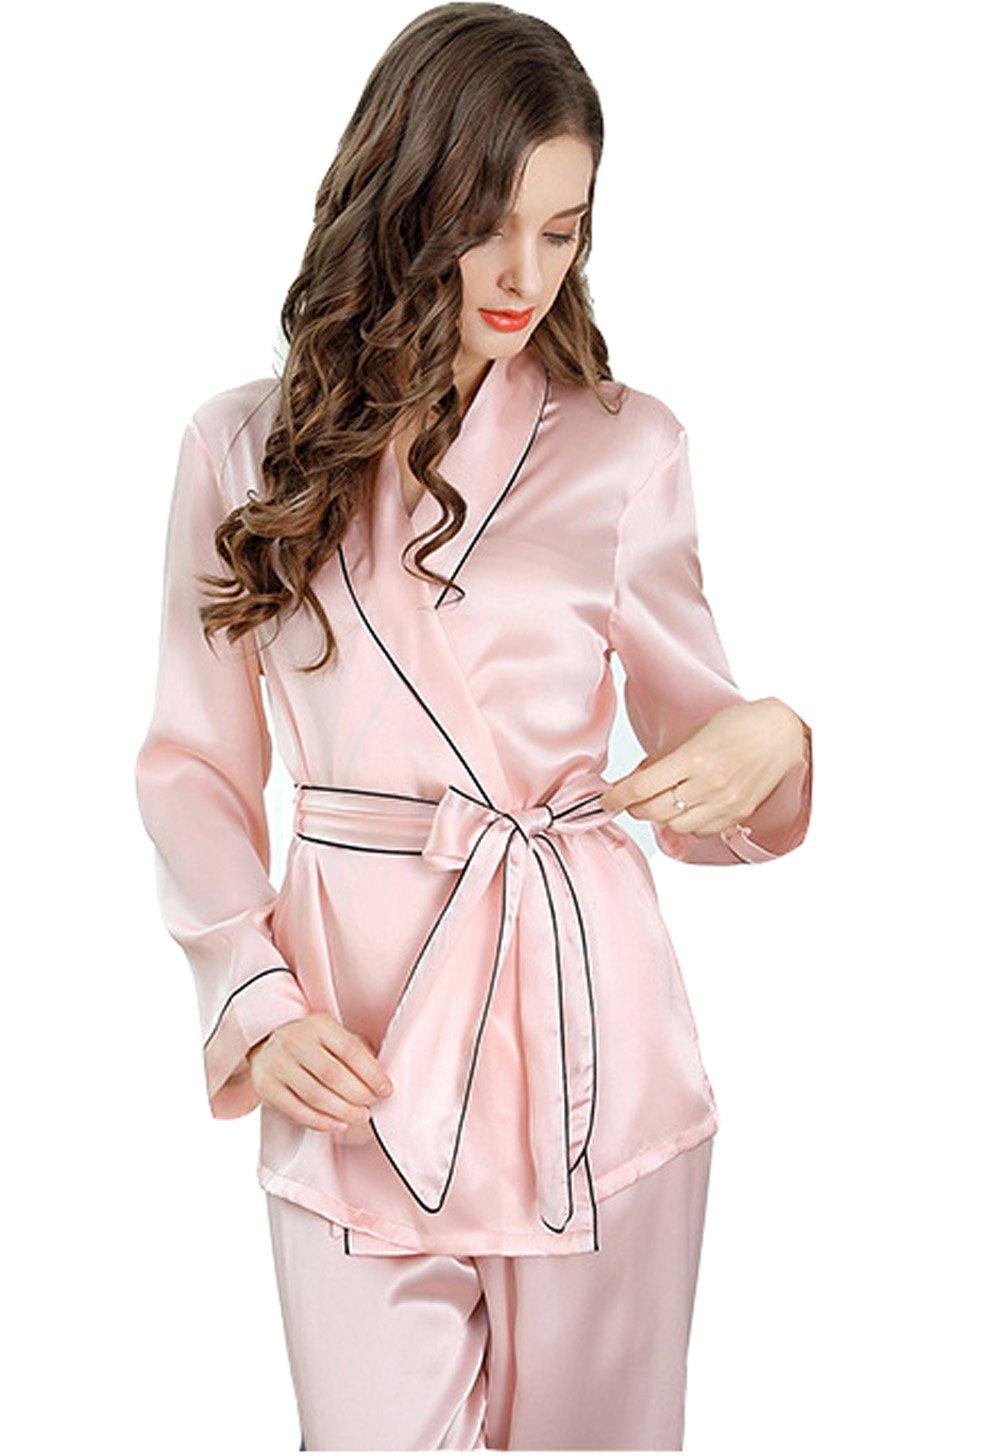 Sunshine Fashion and Simple Silk Long Sleeves Lingerie Pajamas,Silk Nightgown Sleepwear Sets(2 Pieces)